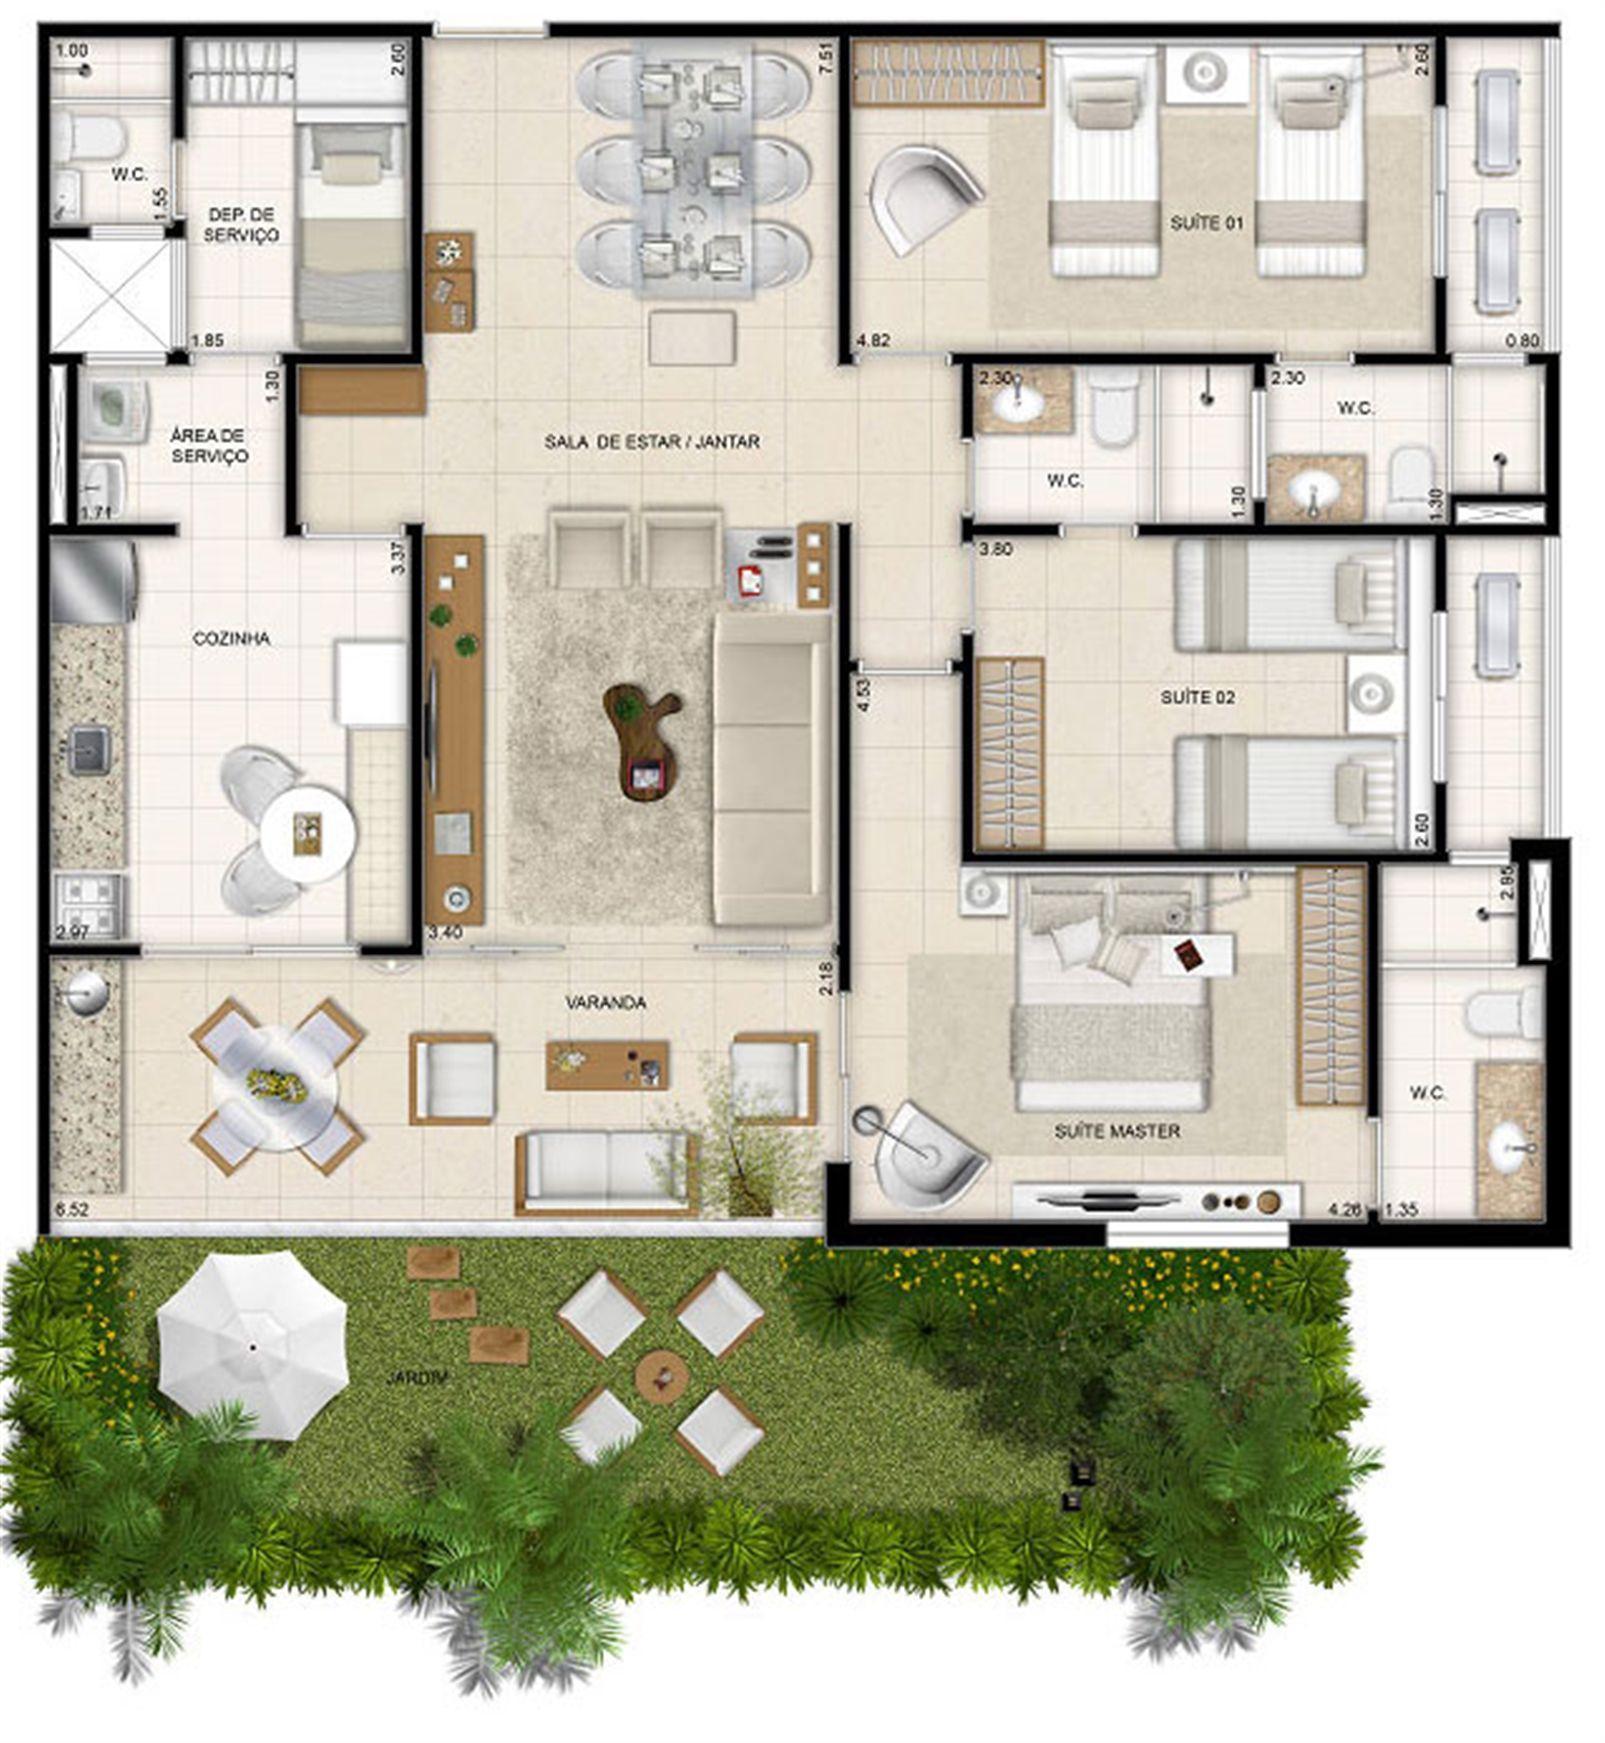 Perspectiva ilustrada da planta Mason Makani 126 m² | Mandara Kauai – Apartamentono  Porto das Dunas - Aquiraz - Ceará